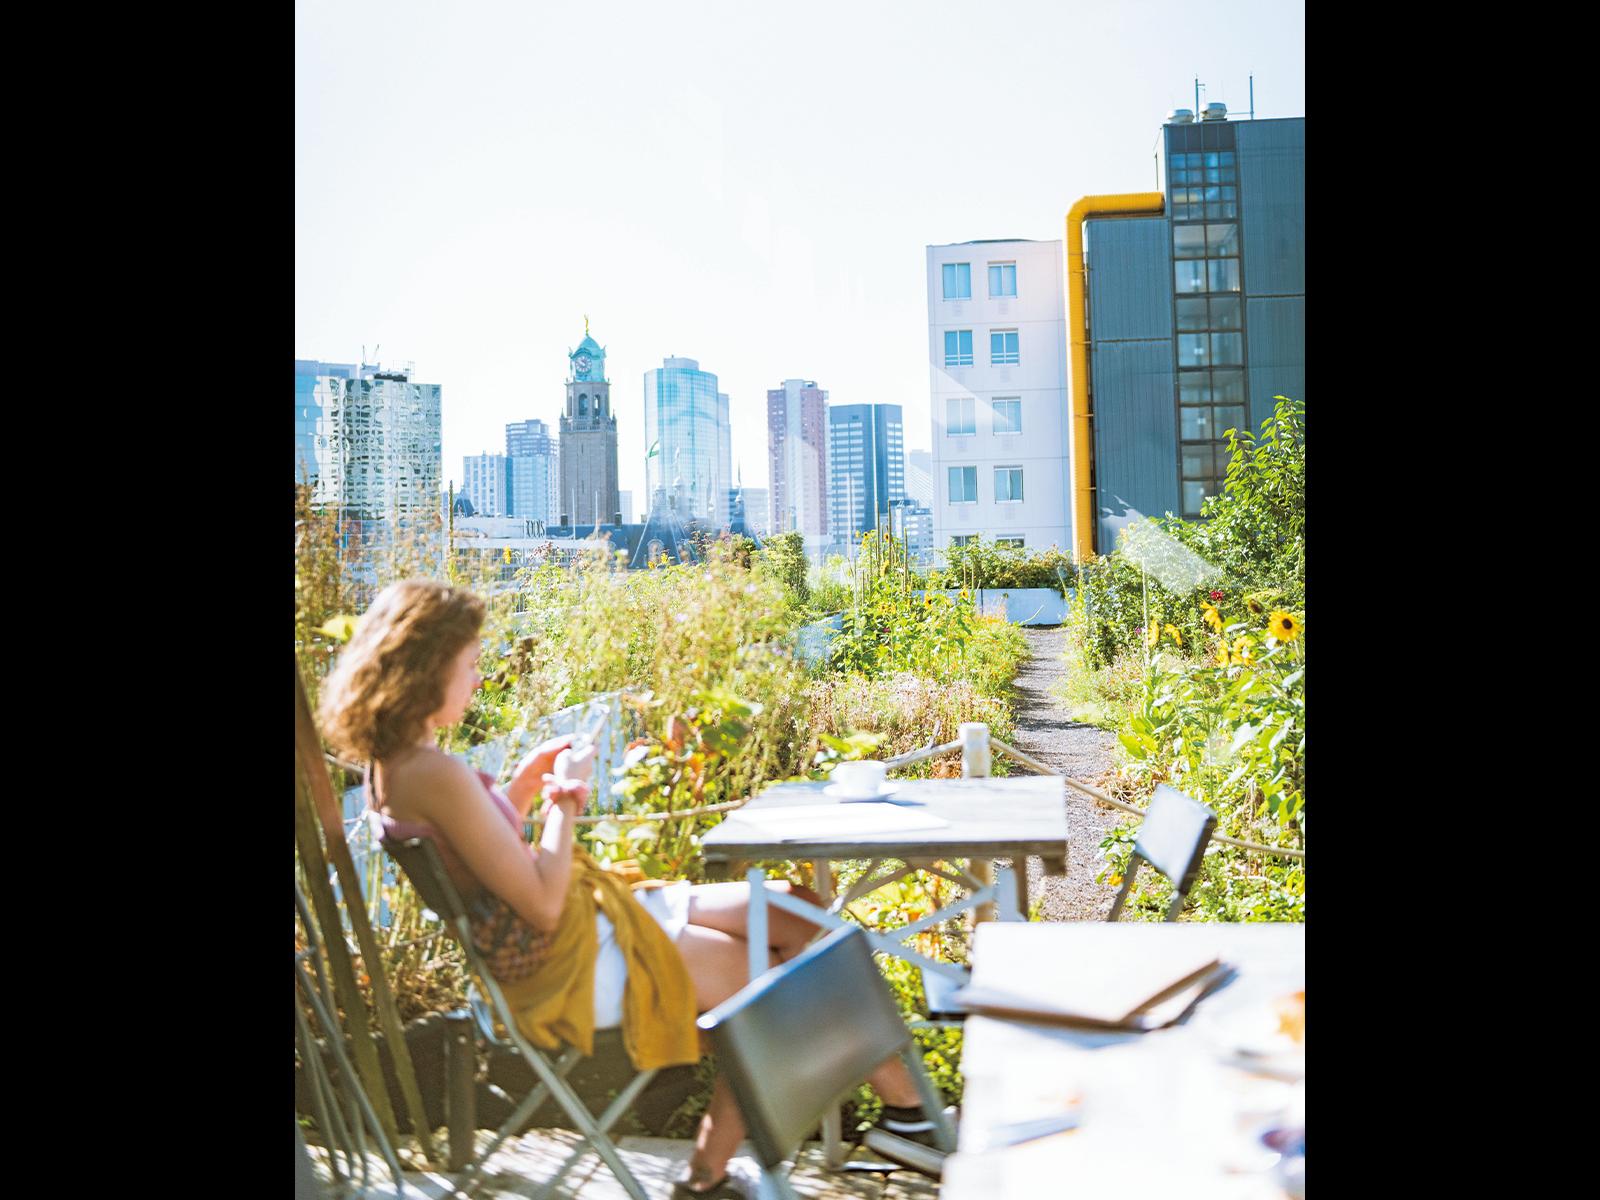 『OP HET DAK』の屋上庭園からの眺め。ロッテルダム市街を一望できる。